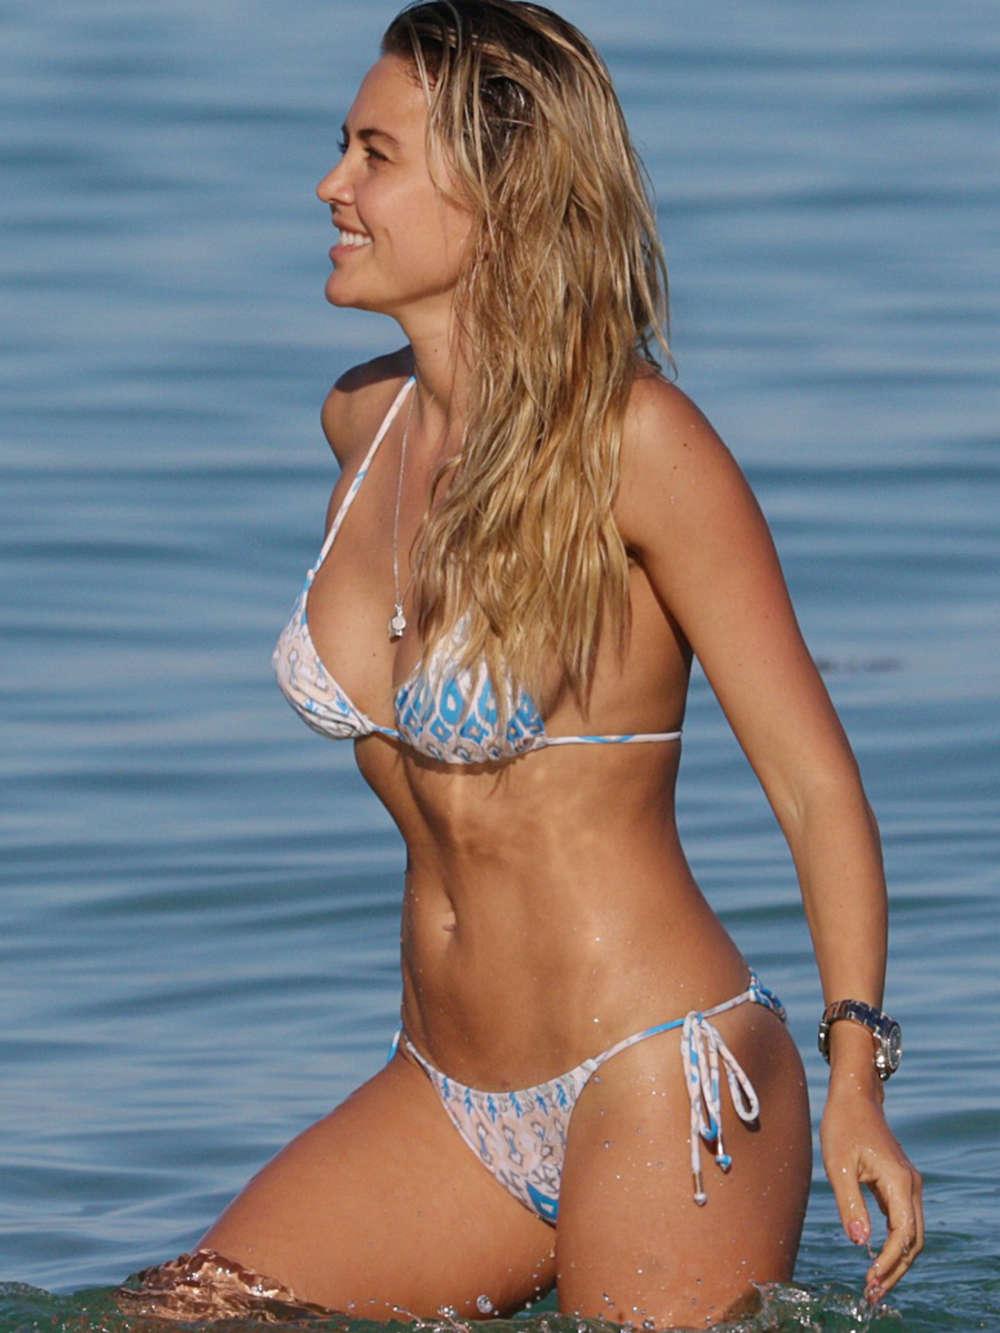 Tetyana Veryovkina nudes (67 photo) Fappening, Snapchat, braless